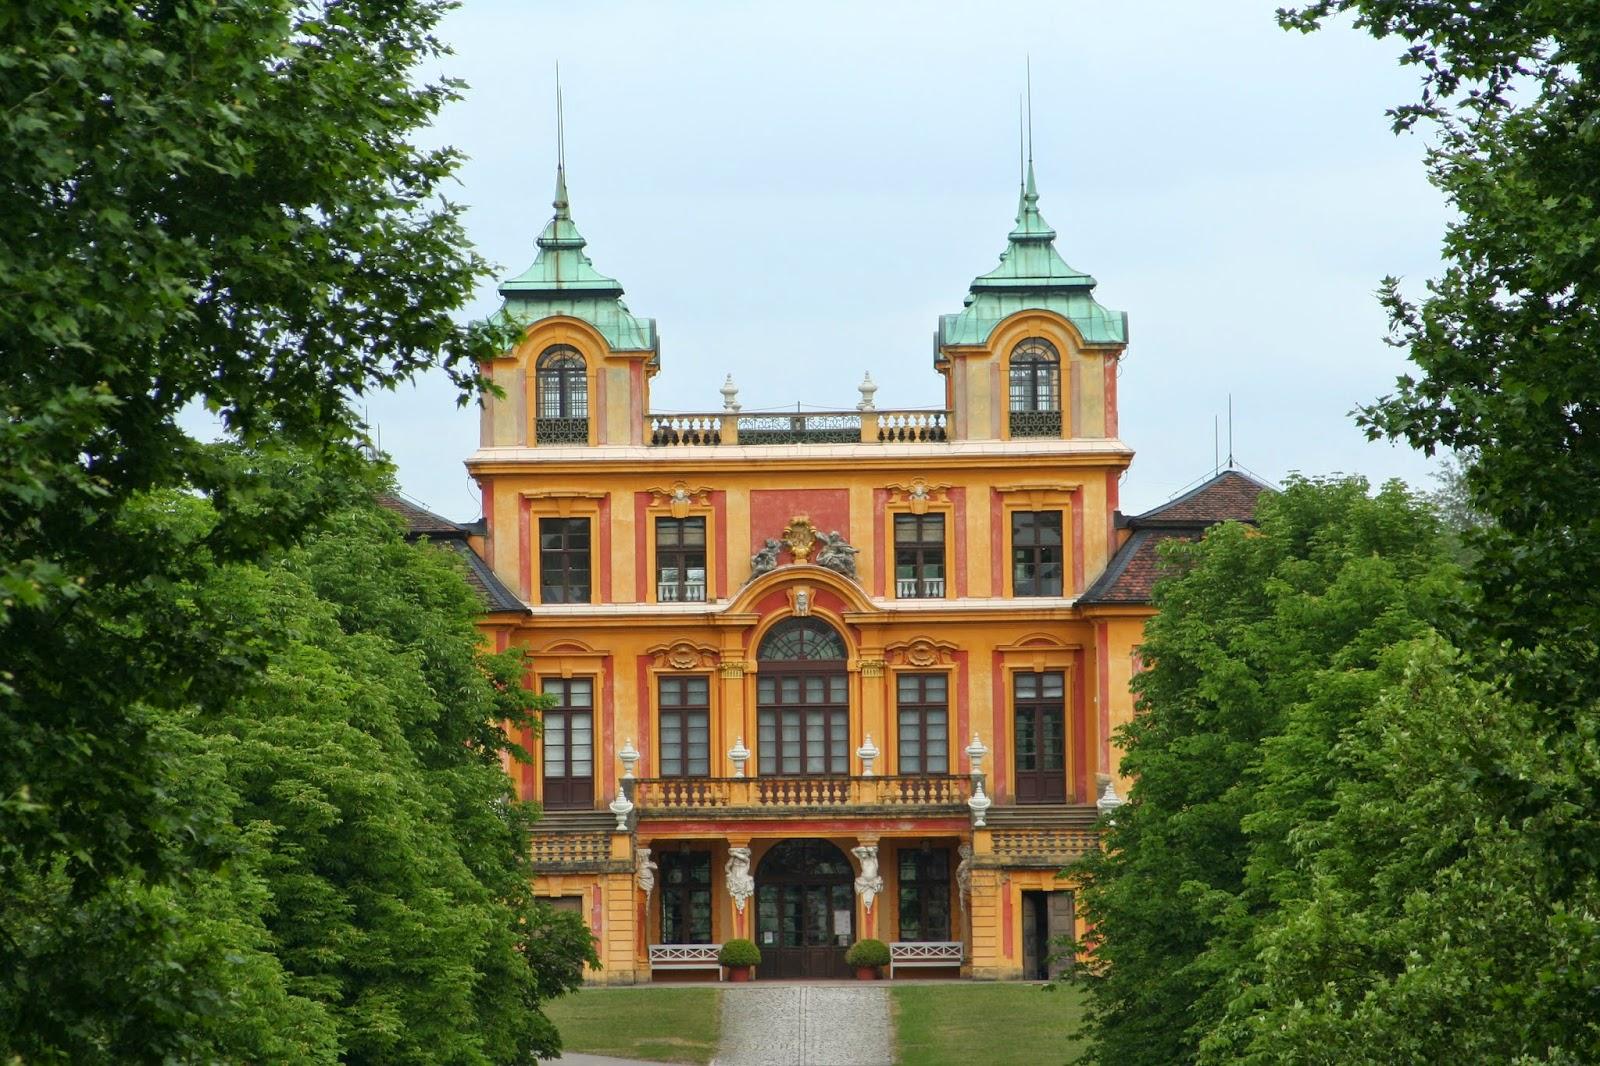 foto del Residenzschloss de Ludwigsburg